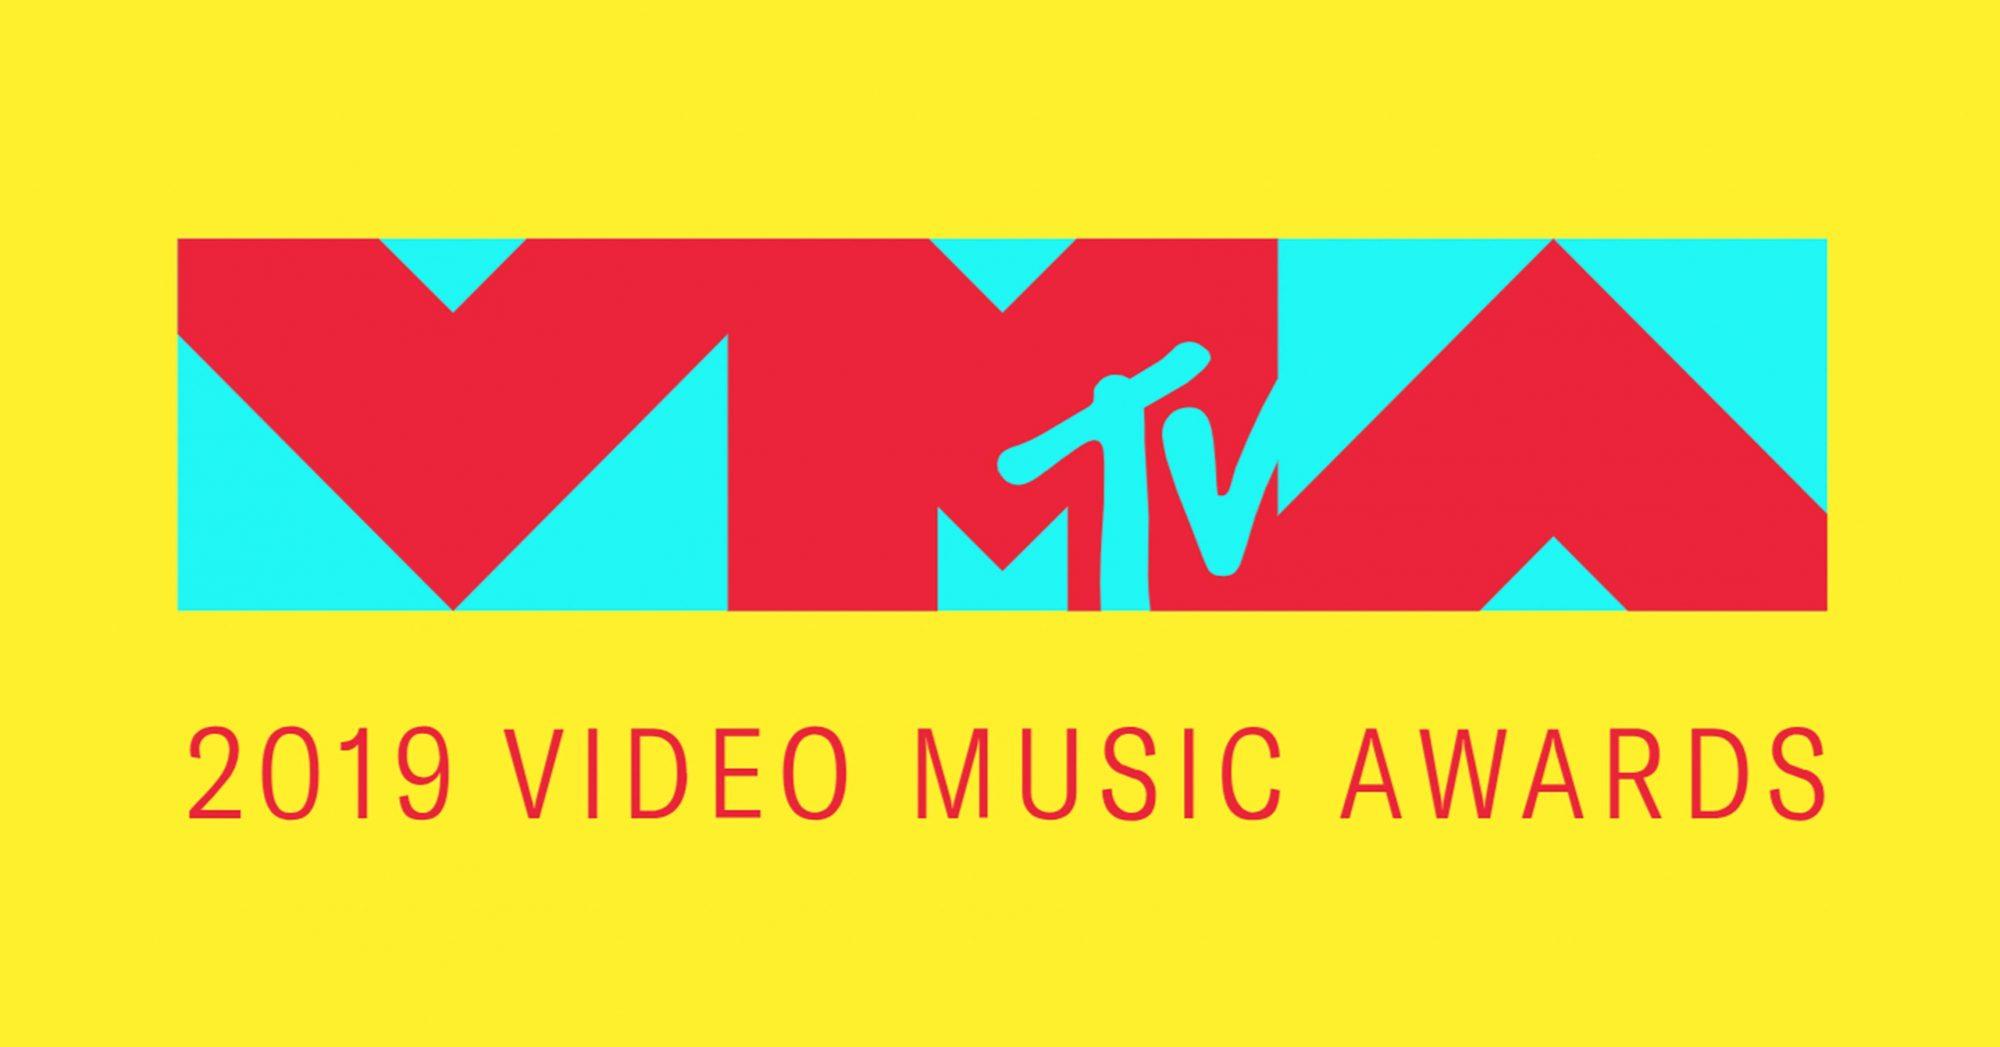 Video Music Awards 2019 Logo